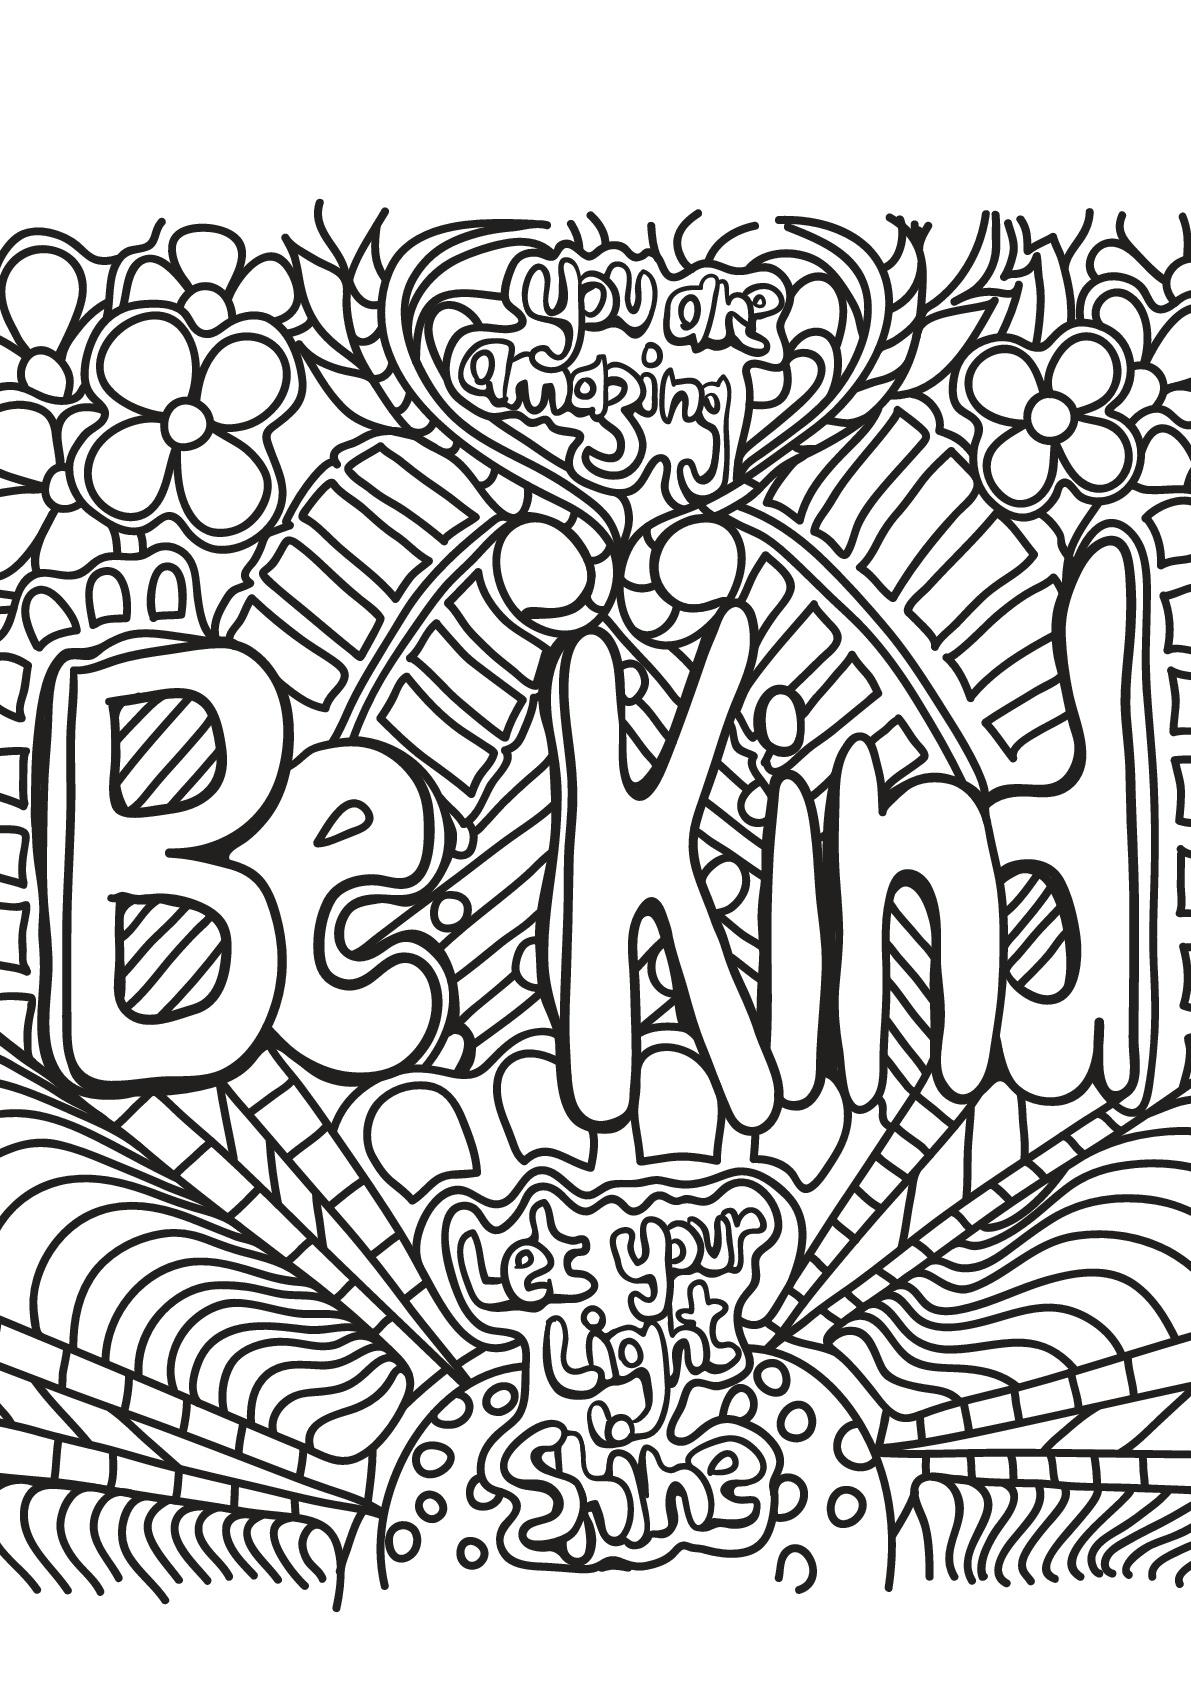 Be kind (Soyez gentils)